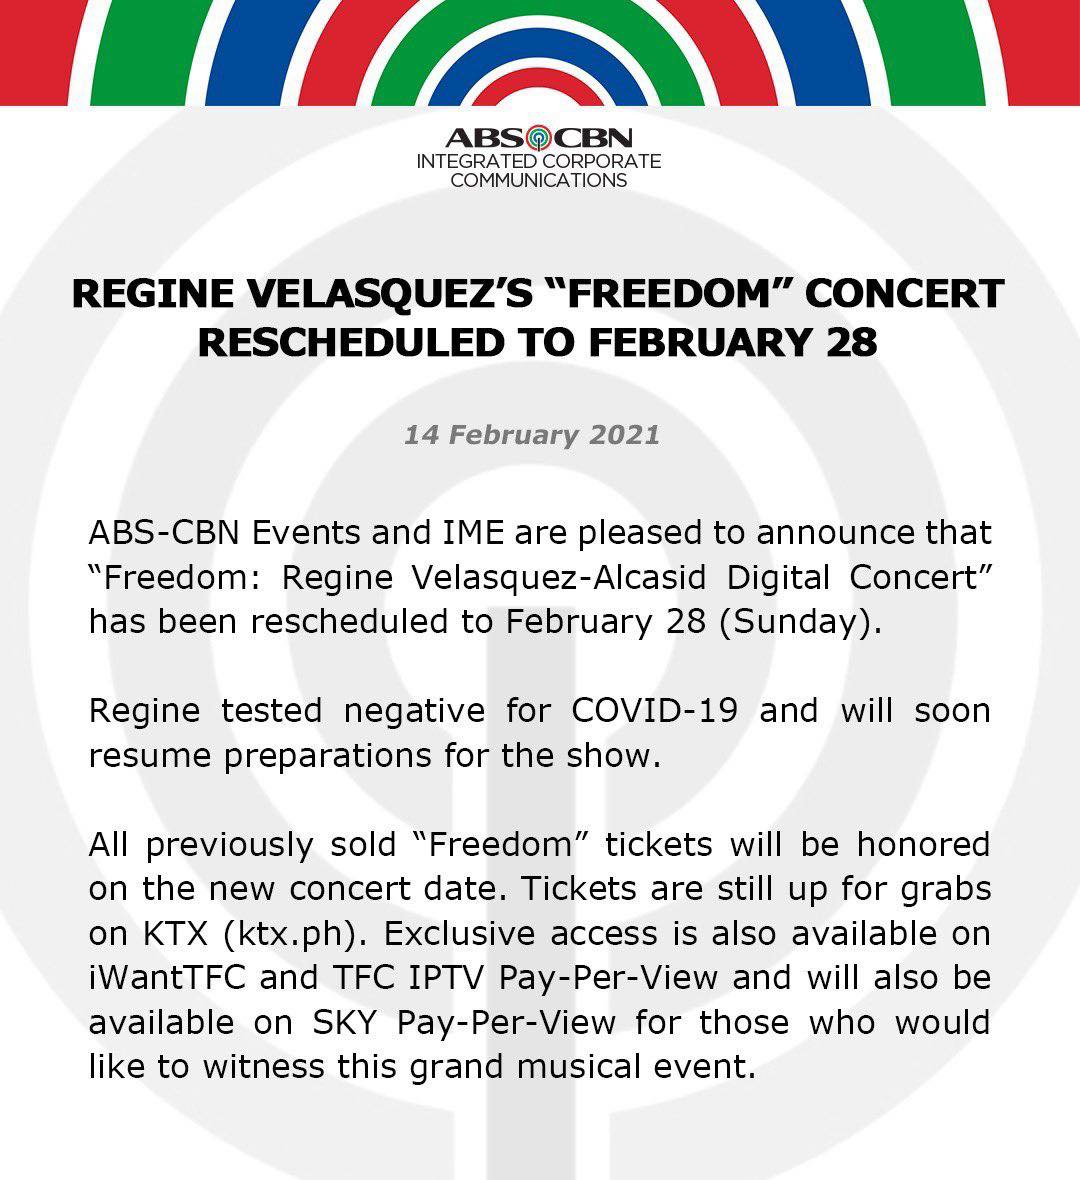 Regine Velasquez online Valentine's concert postponement statement